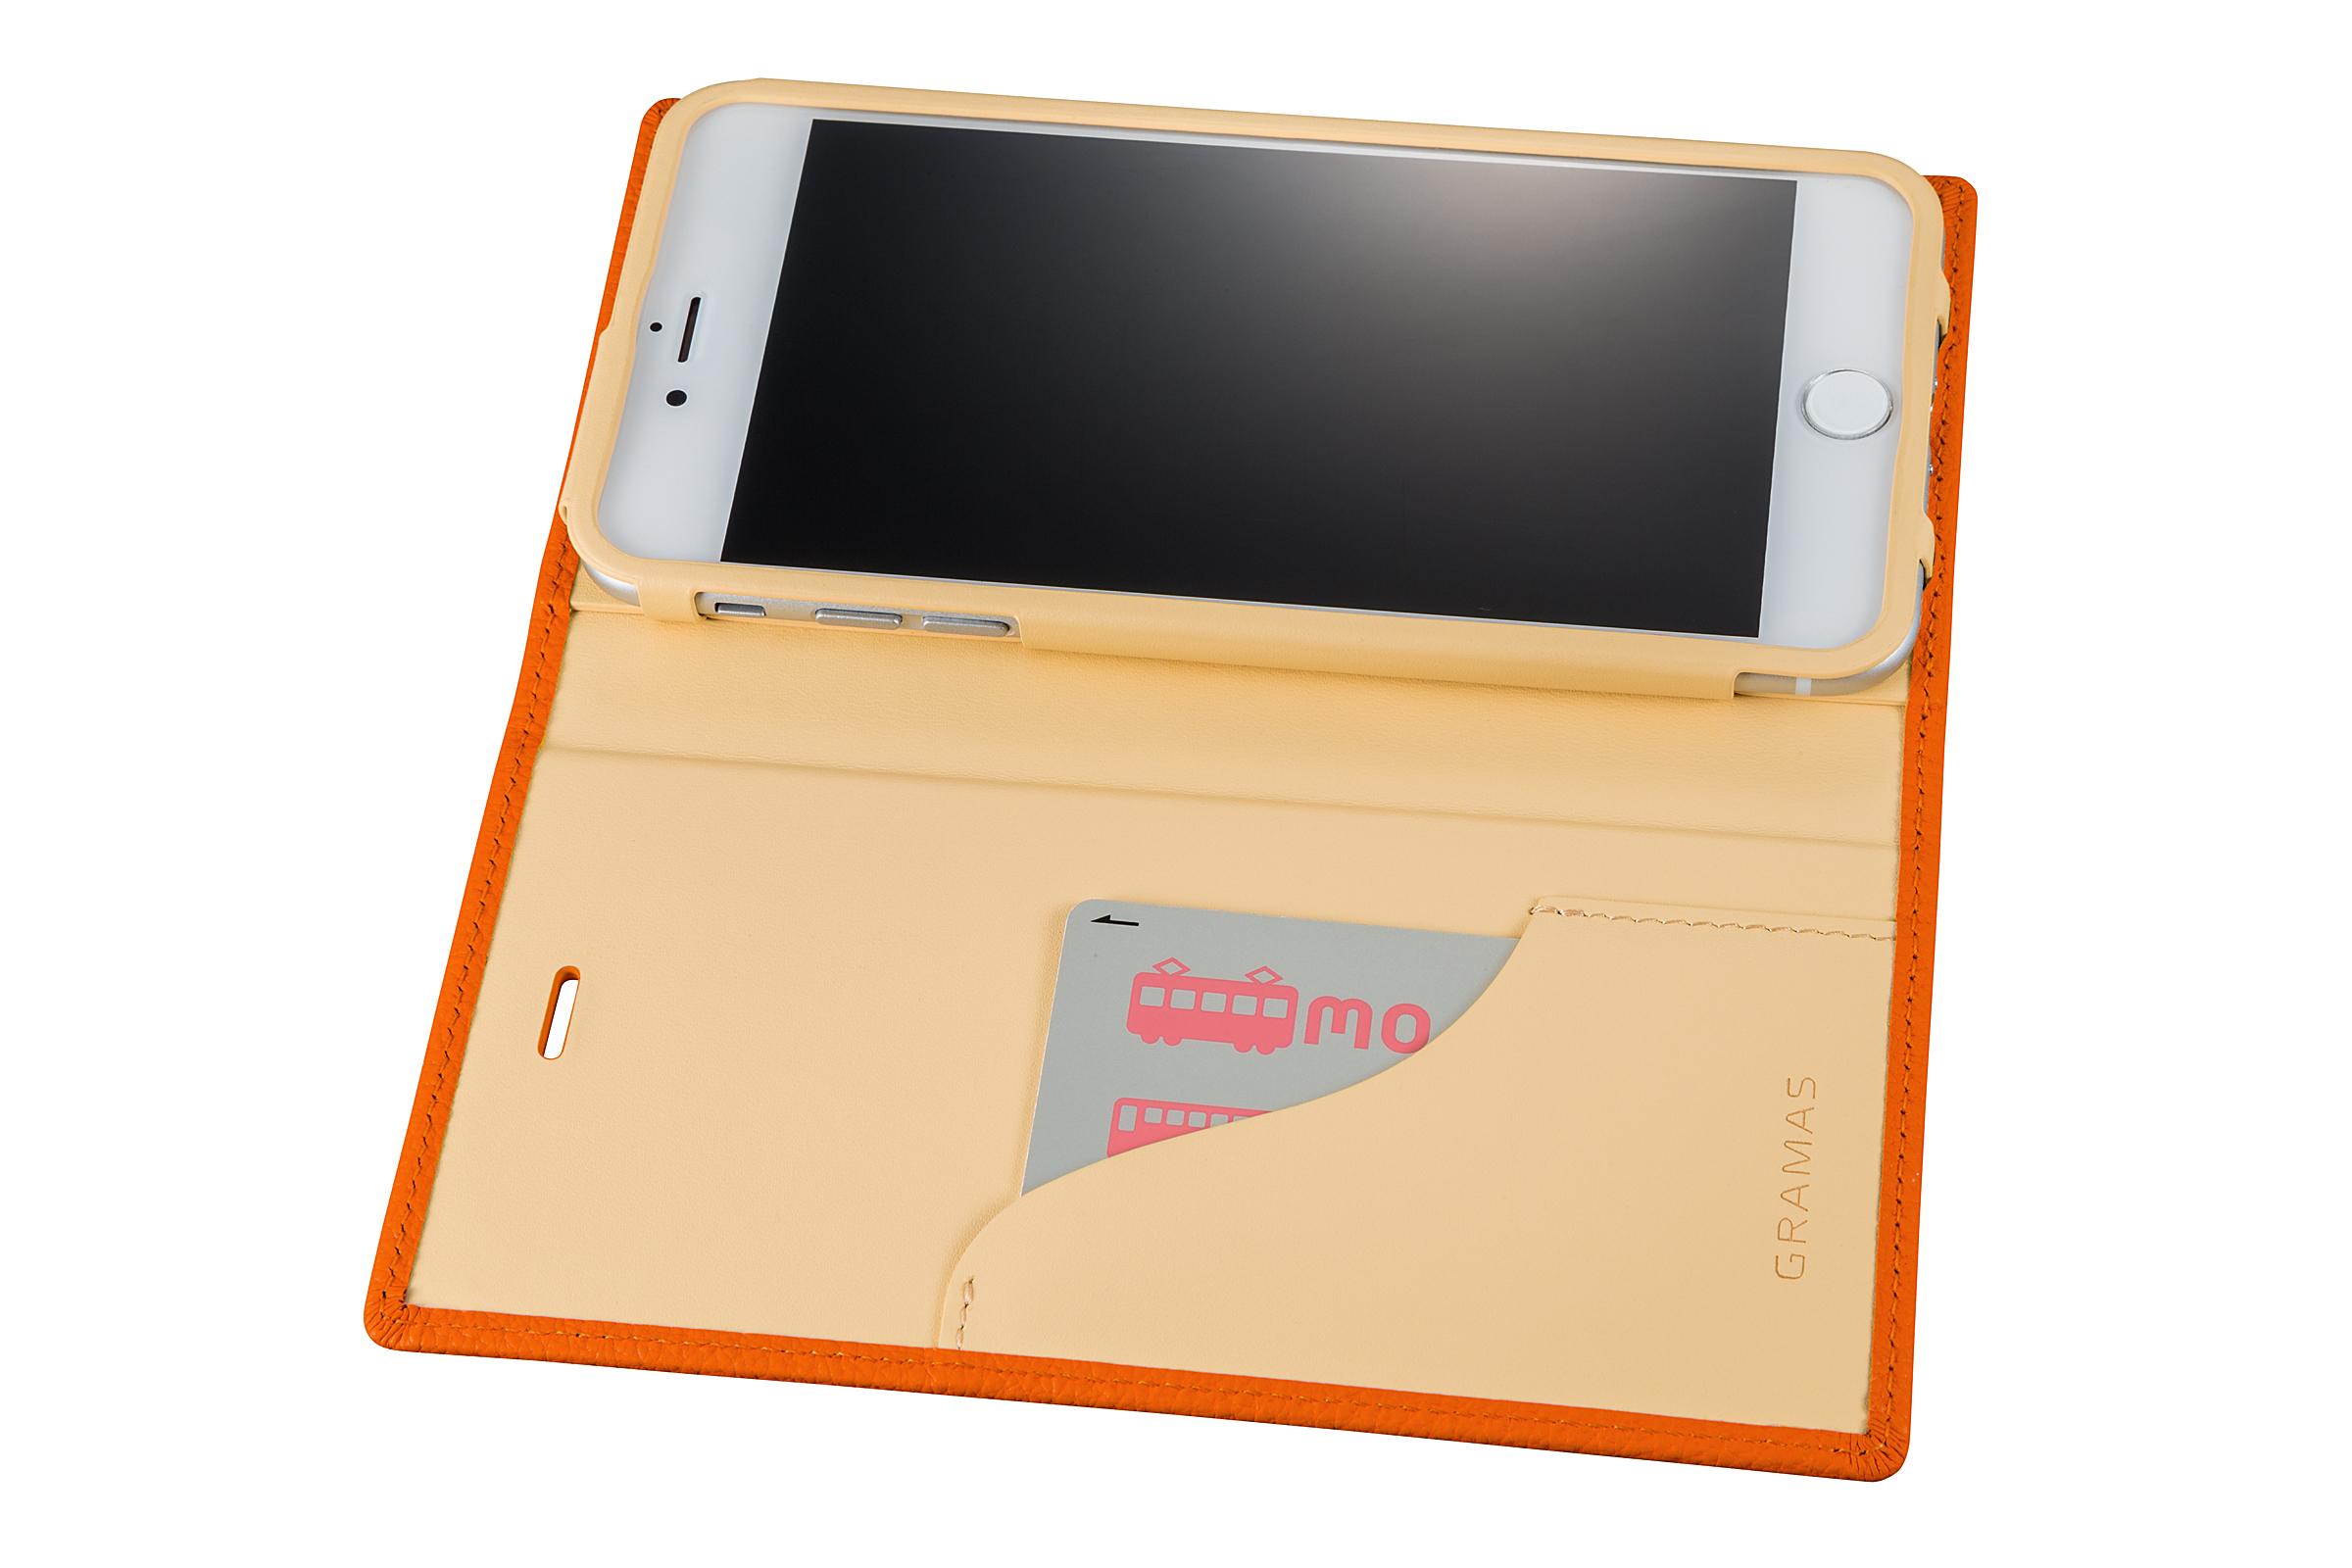 GRAMAS Shrunken-calf Full Leather Case for iPhone 7 Plus(Orange) シュランケンカーフ 手帳型フルレザーケース - 画像4